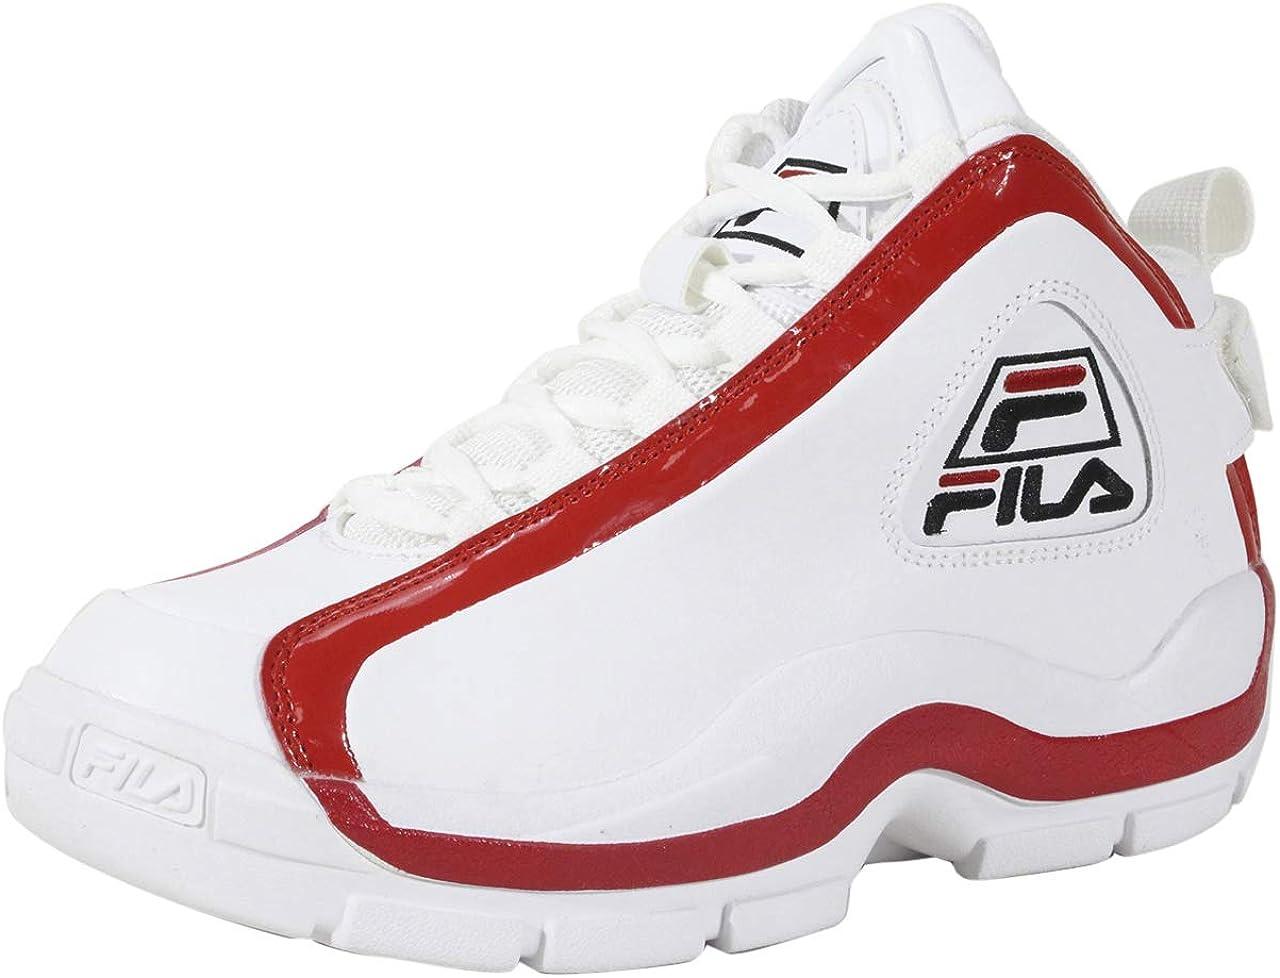 Fila Men's Grant Hill 2 Sneakers